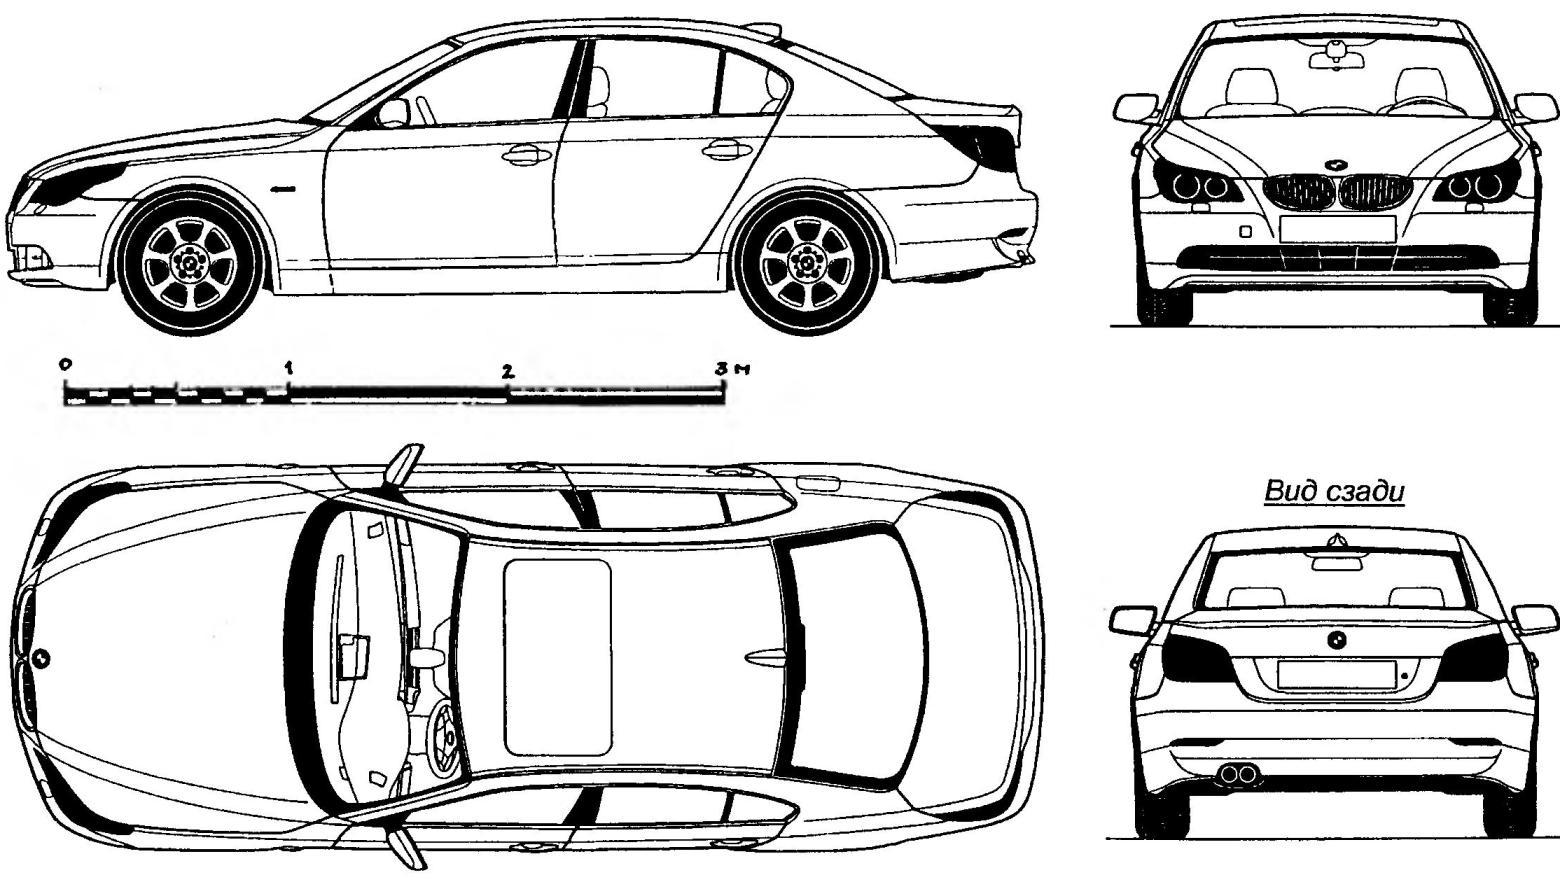 Geometric diagram of a BMW 530i